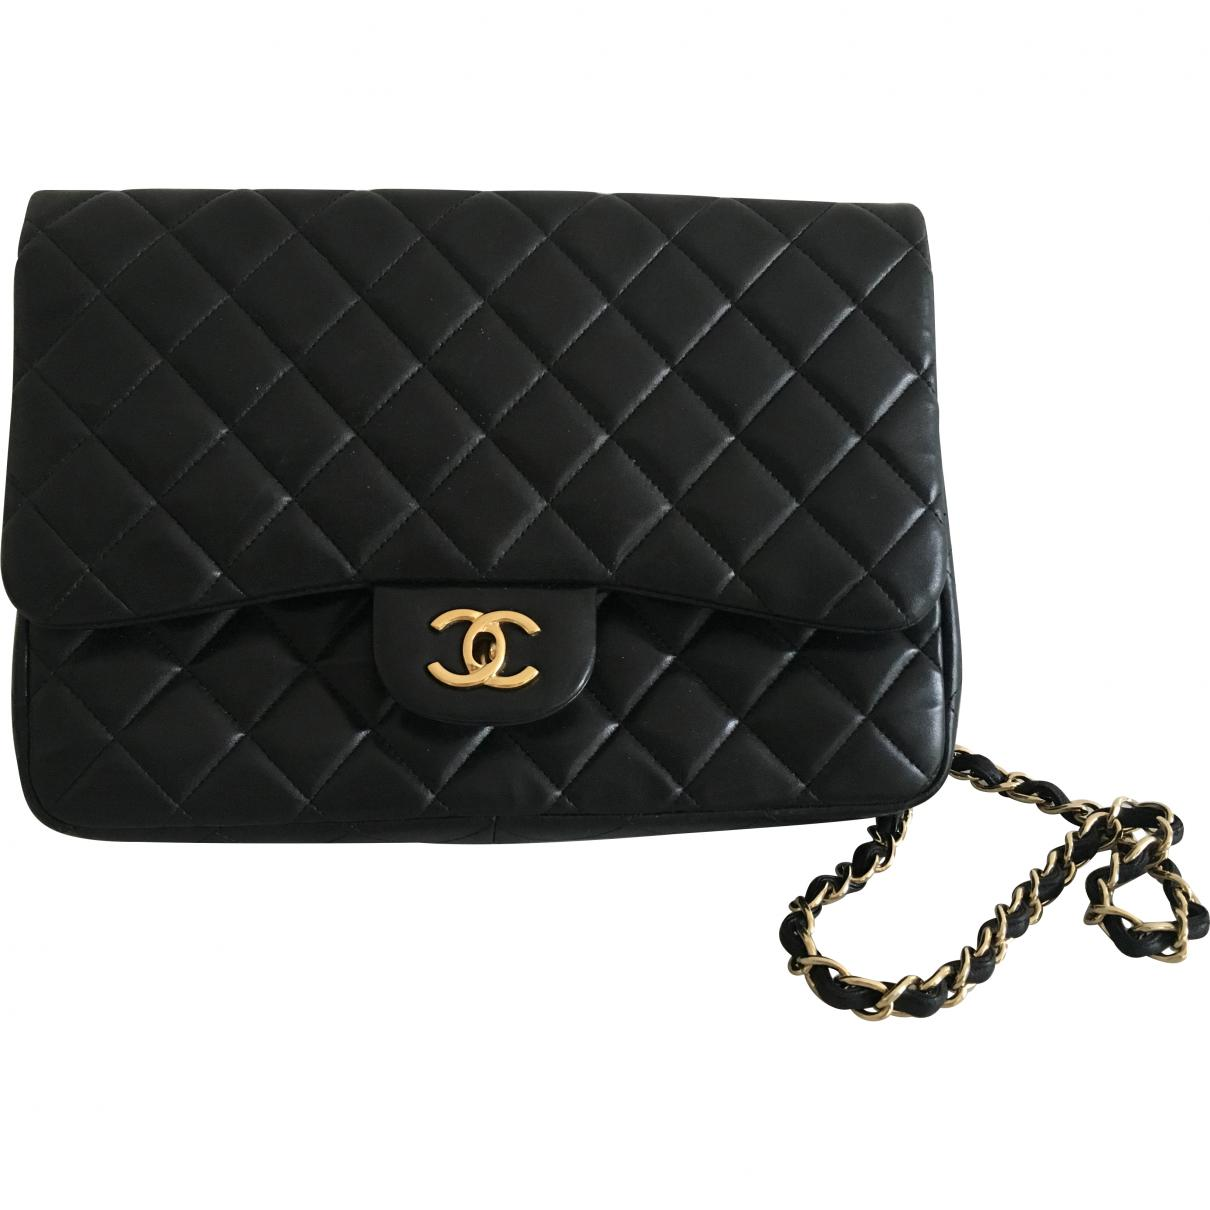 6f99be66aeedb1 Lyst - Chanel Timeless Leather Crossbody Bag in Black